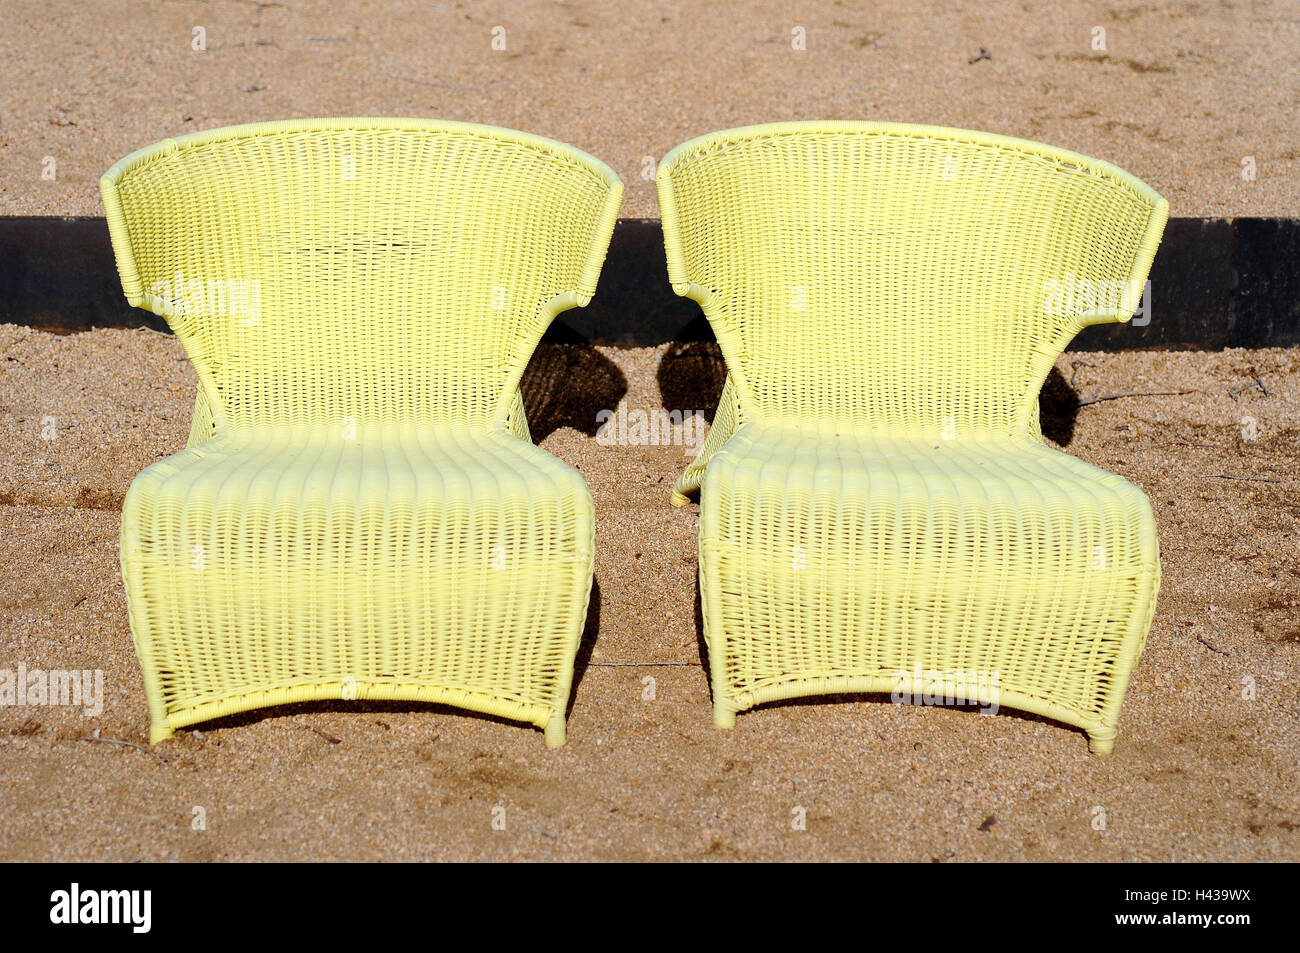 Sedie Pieghevoli Gialle : Sedie gialle immagini sedie gialle fotos stock alamy